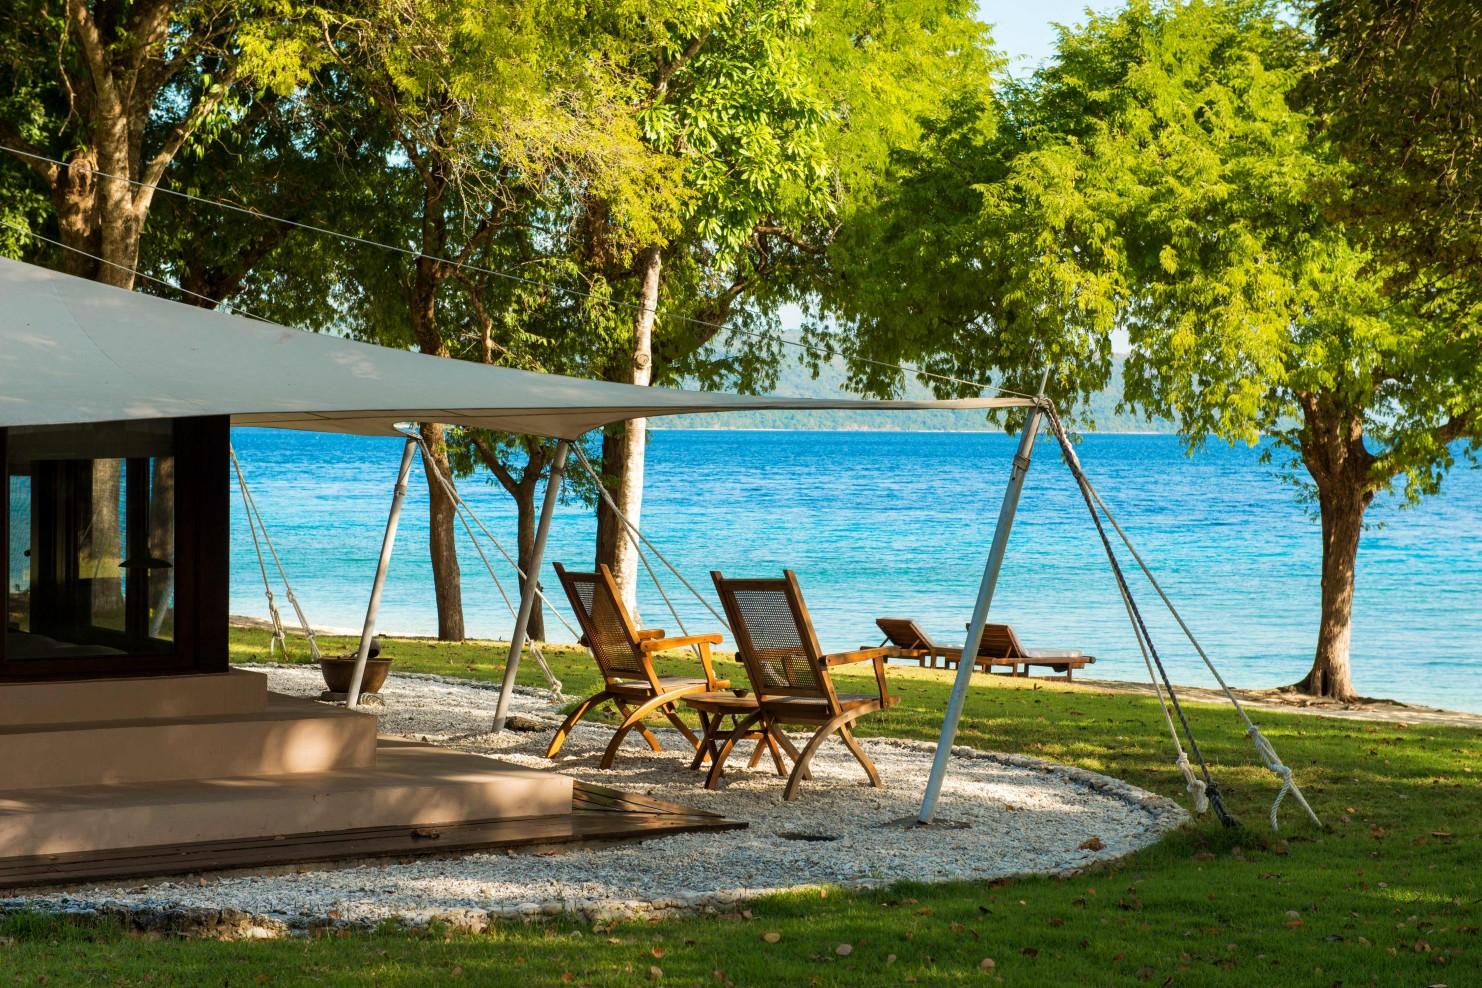 amanwana hotel moyo island smith hotels rh mrandmrssmith com